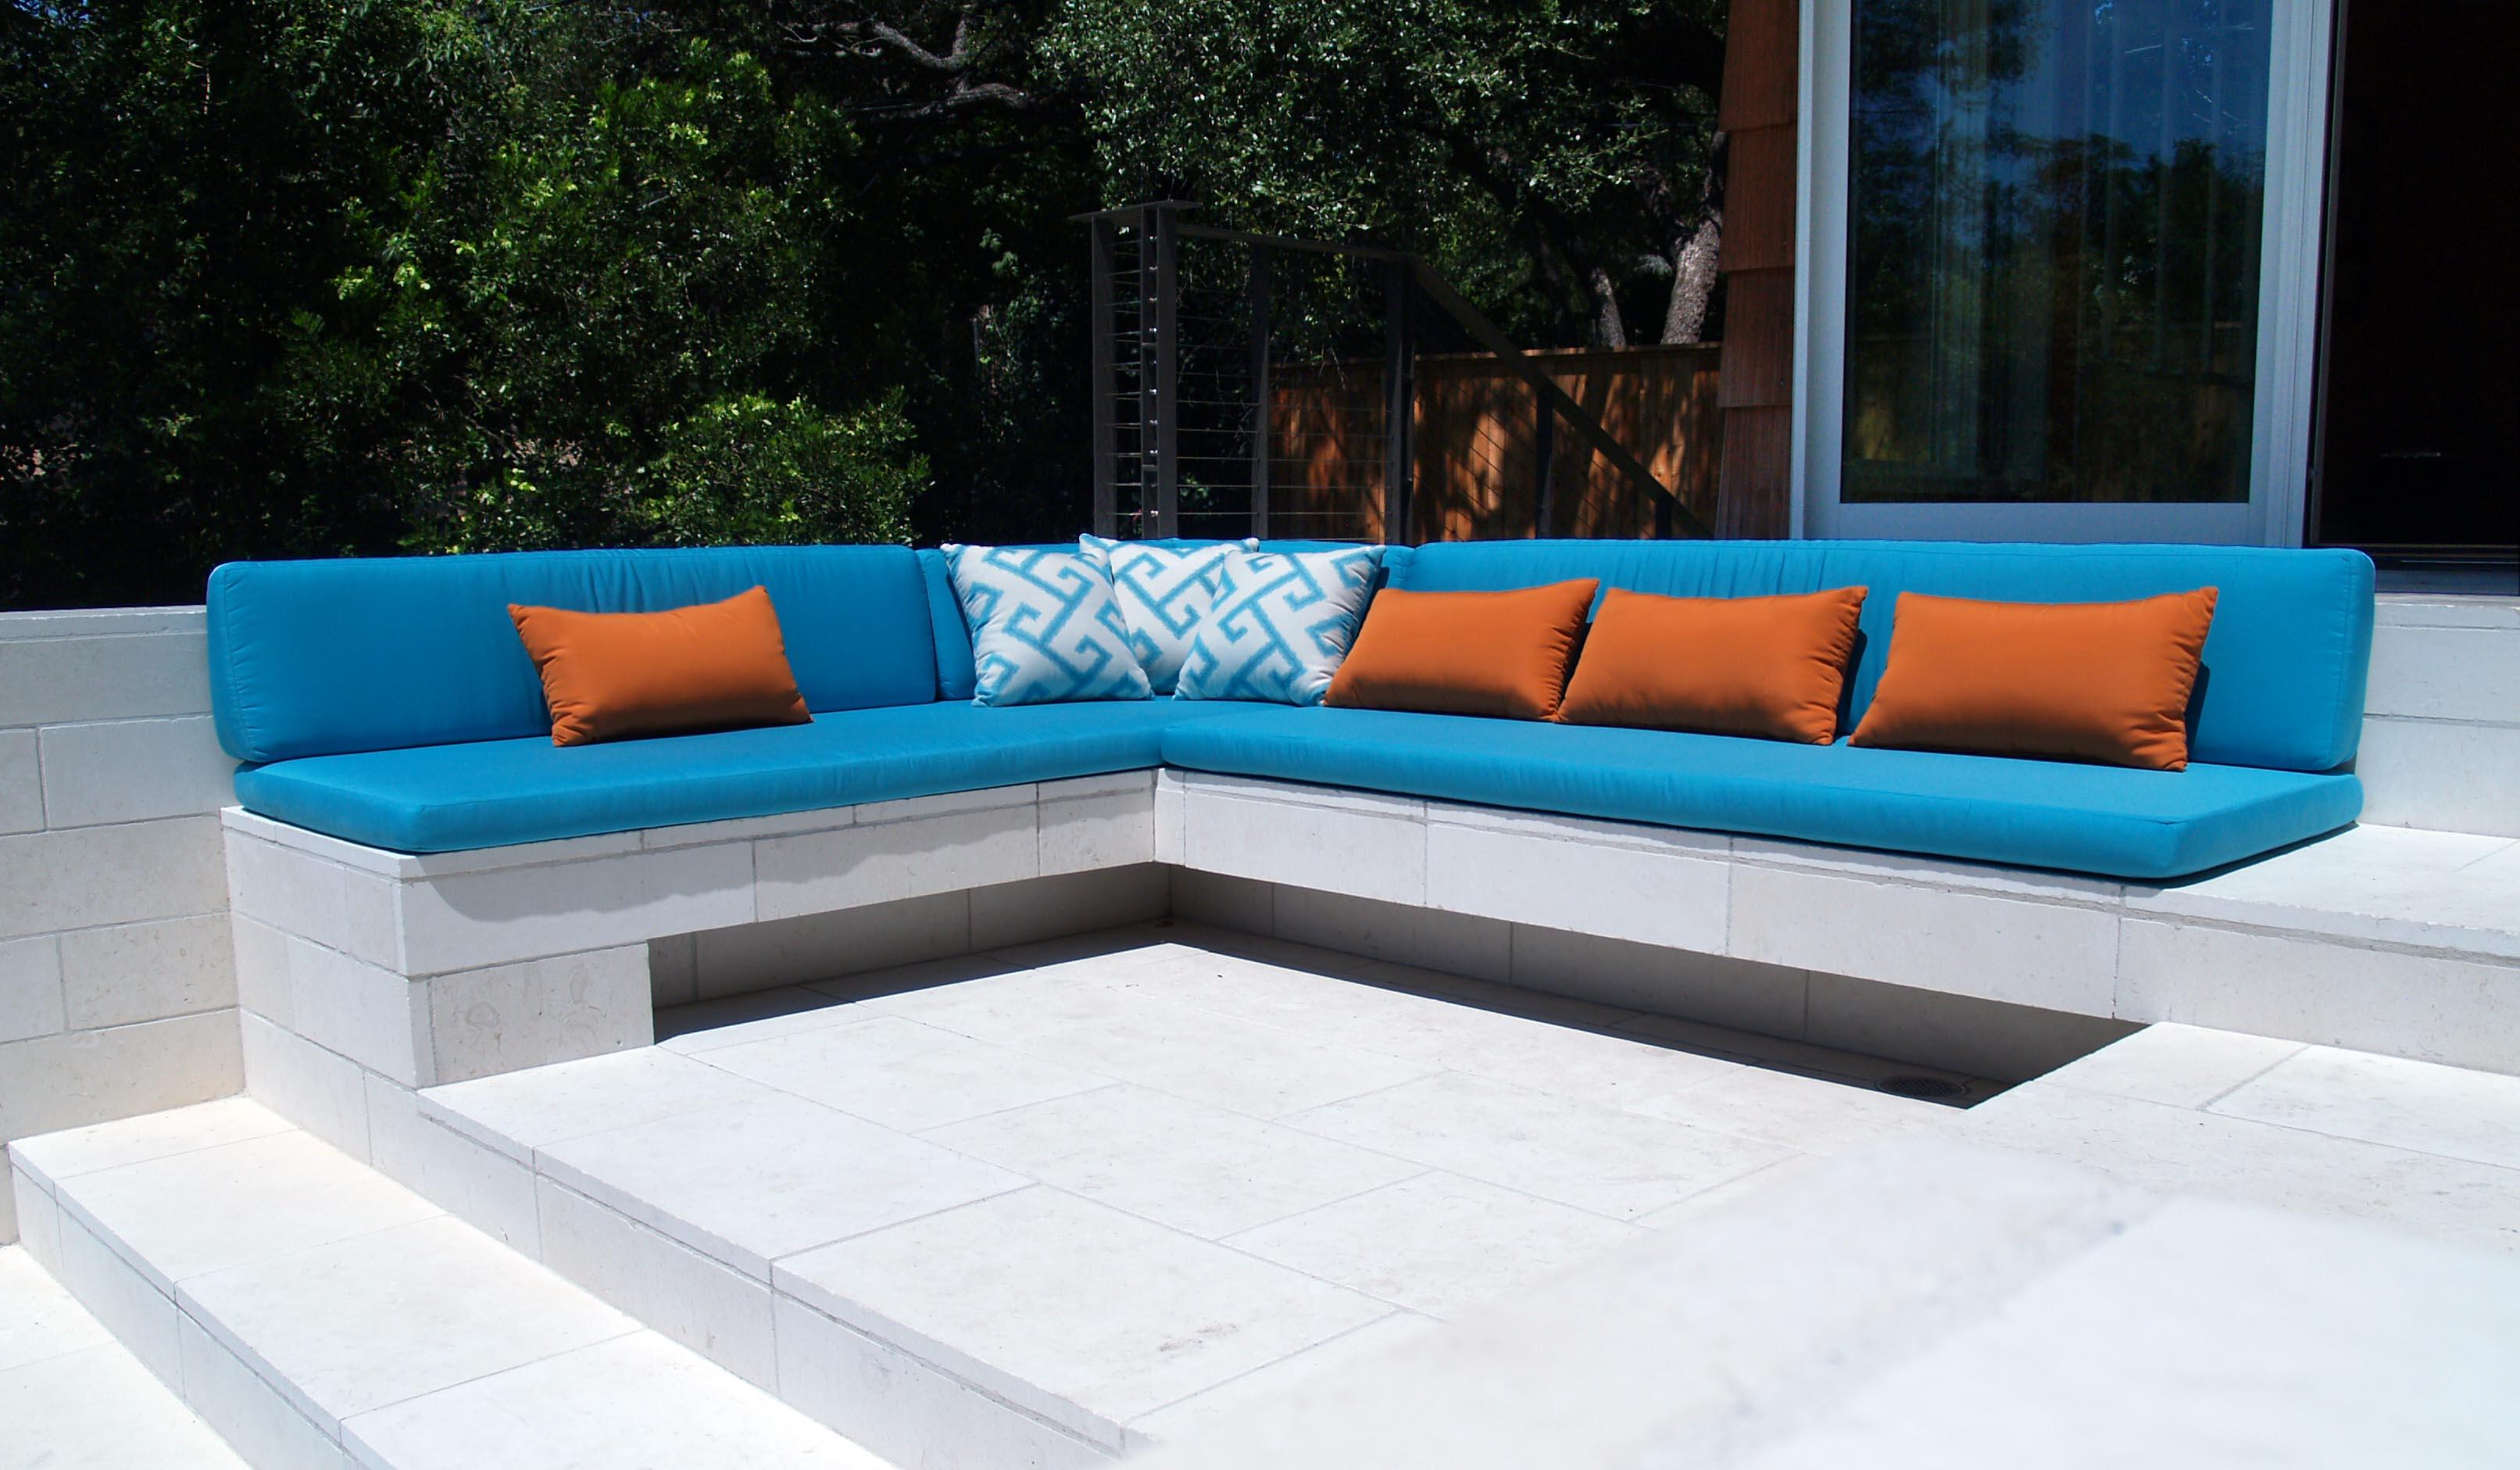 Alabama Awnings Outdoor Patio Cushions